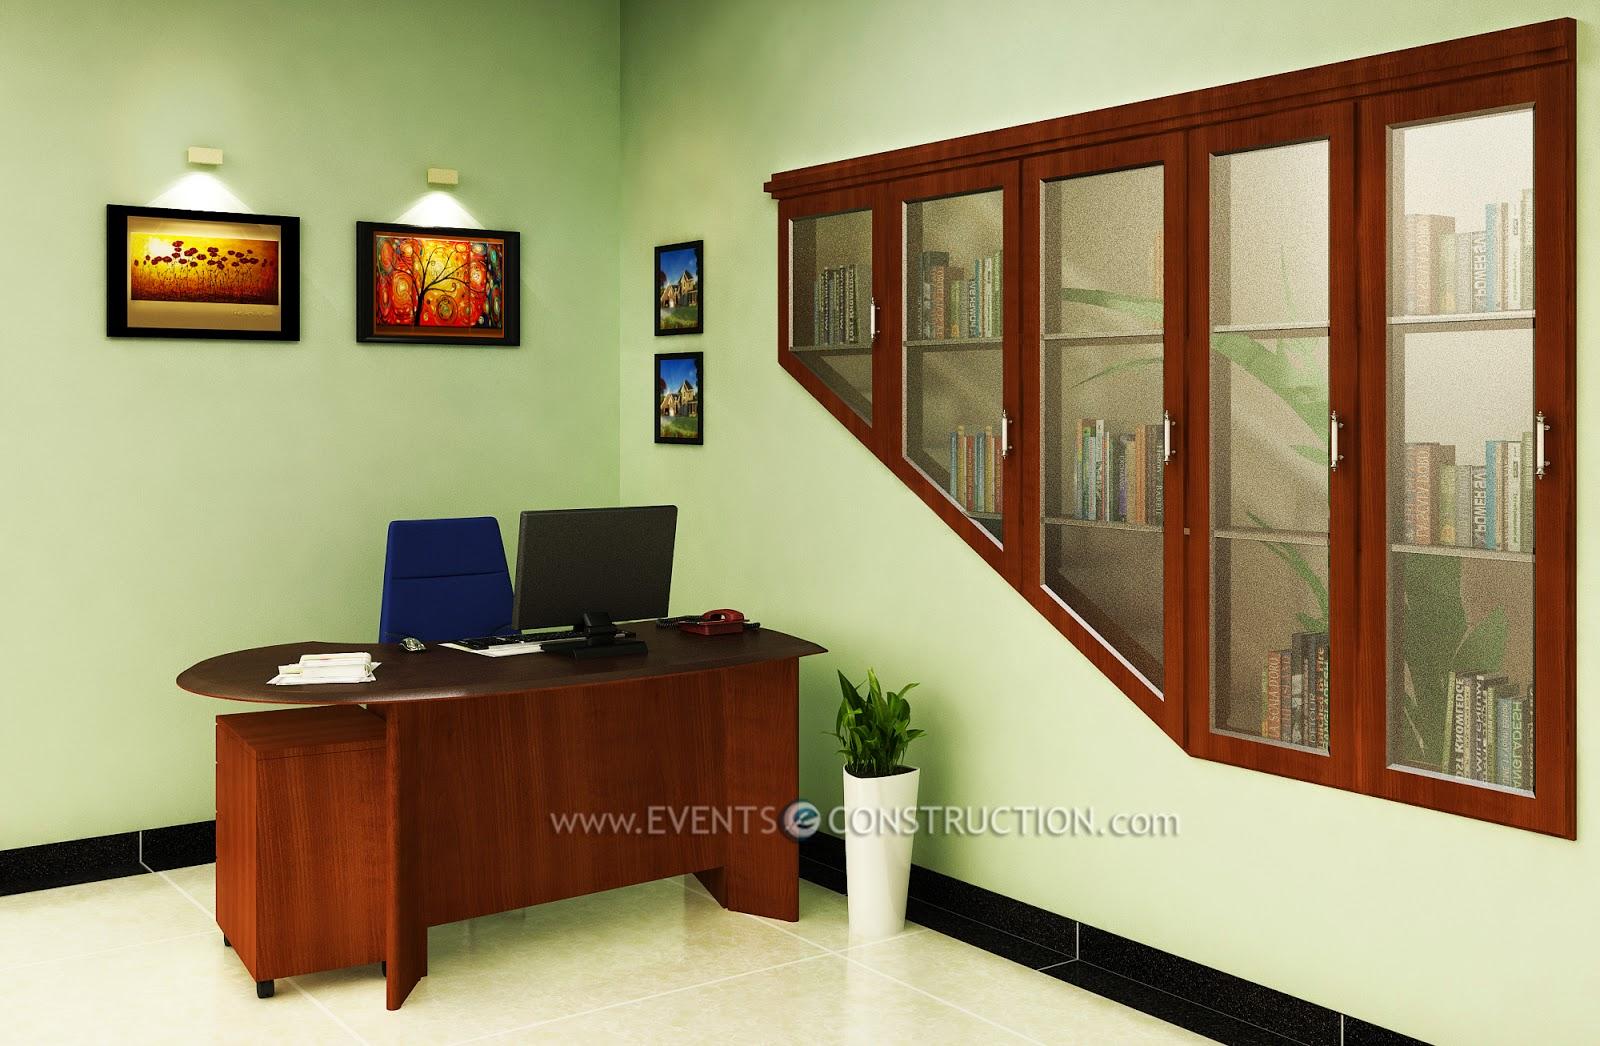 Evens construction pvt ltd home office design for Home office design ltd